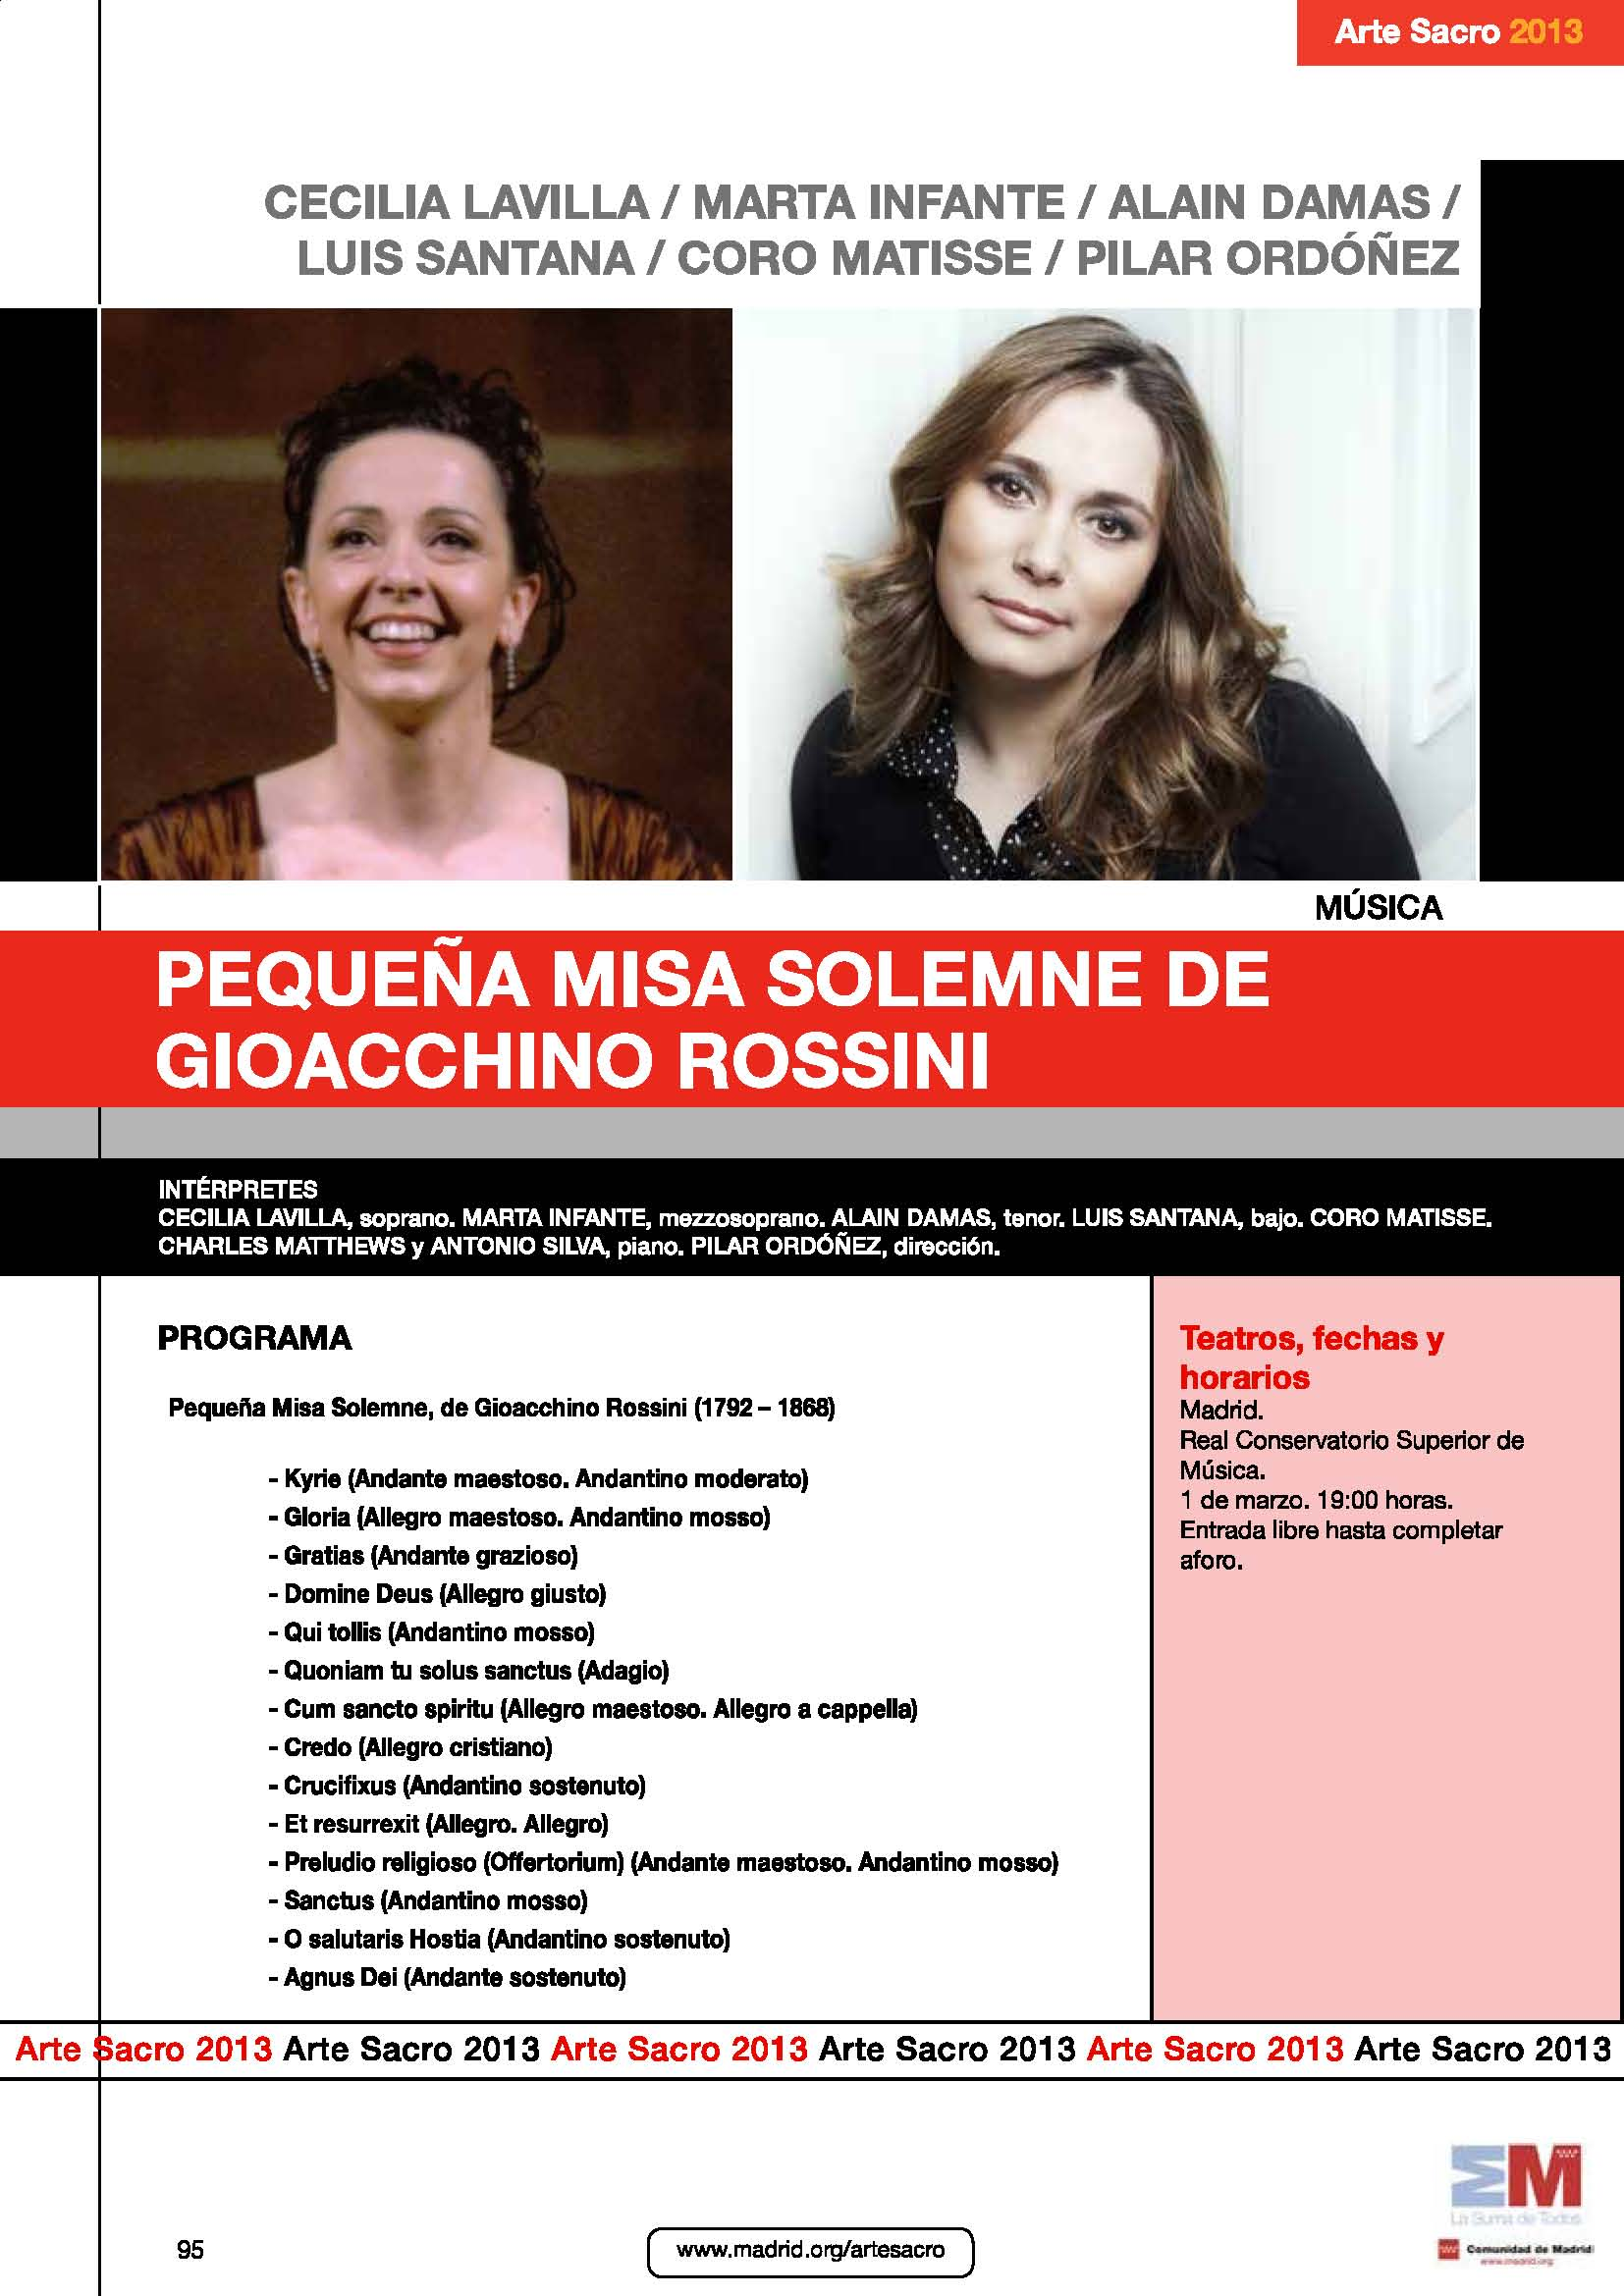 dossier_completo_Página_095